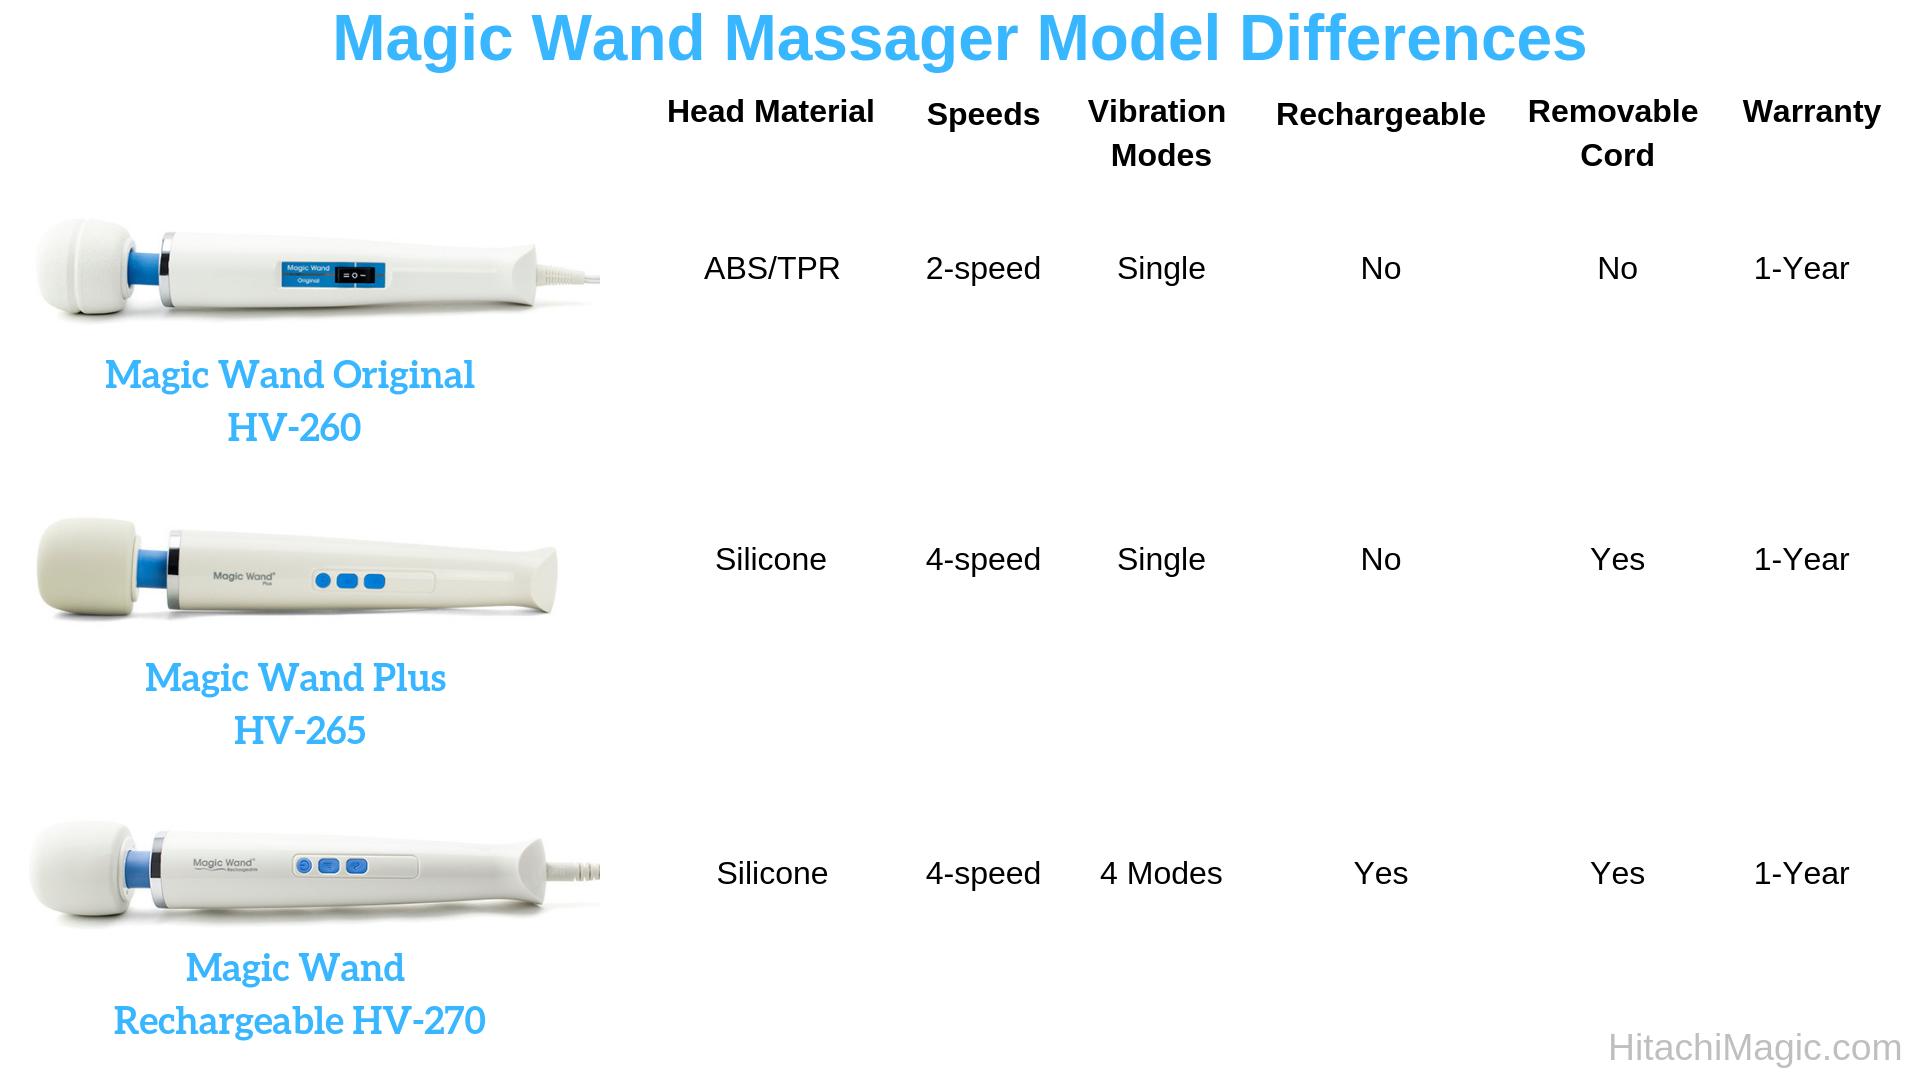 Magic Wand Massager Differences